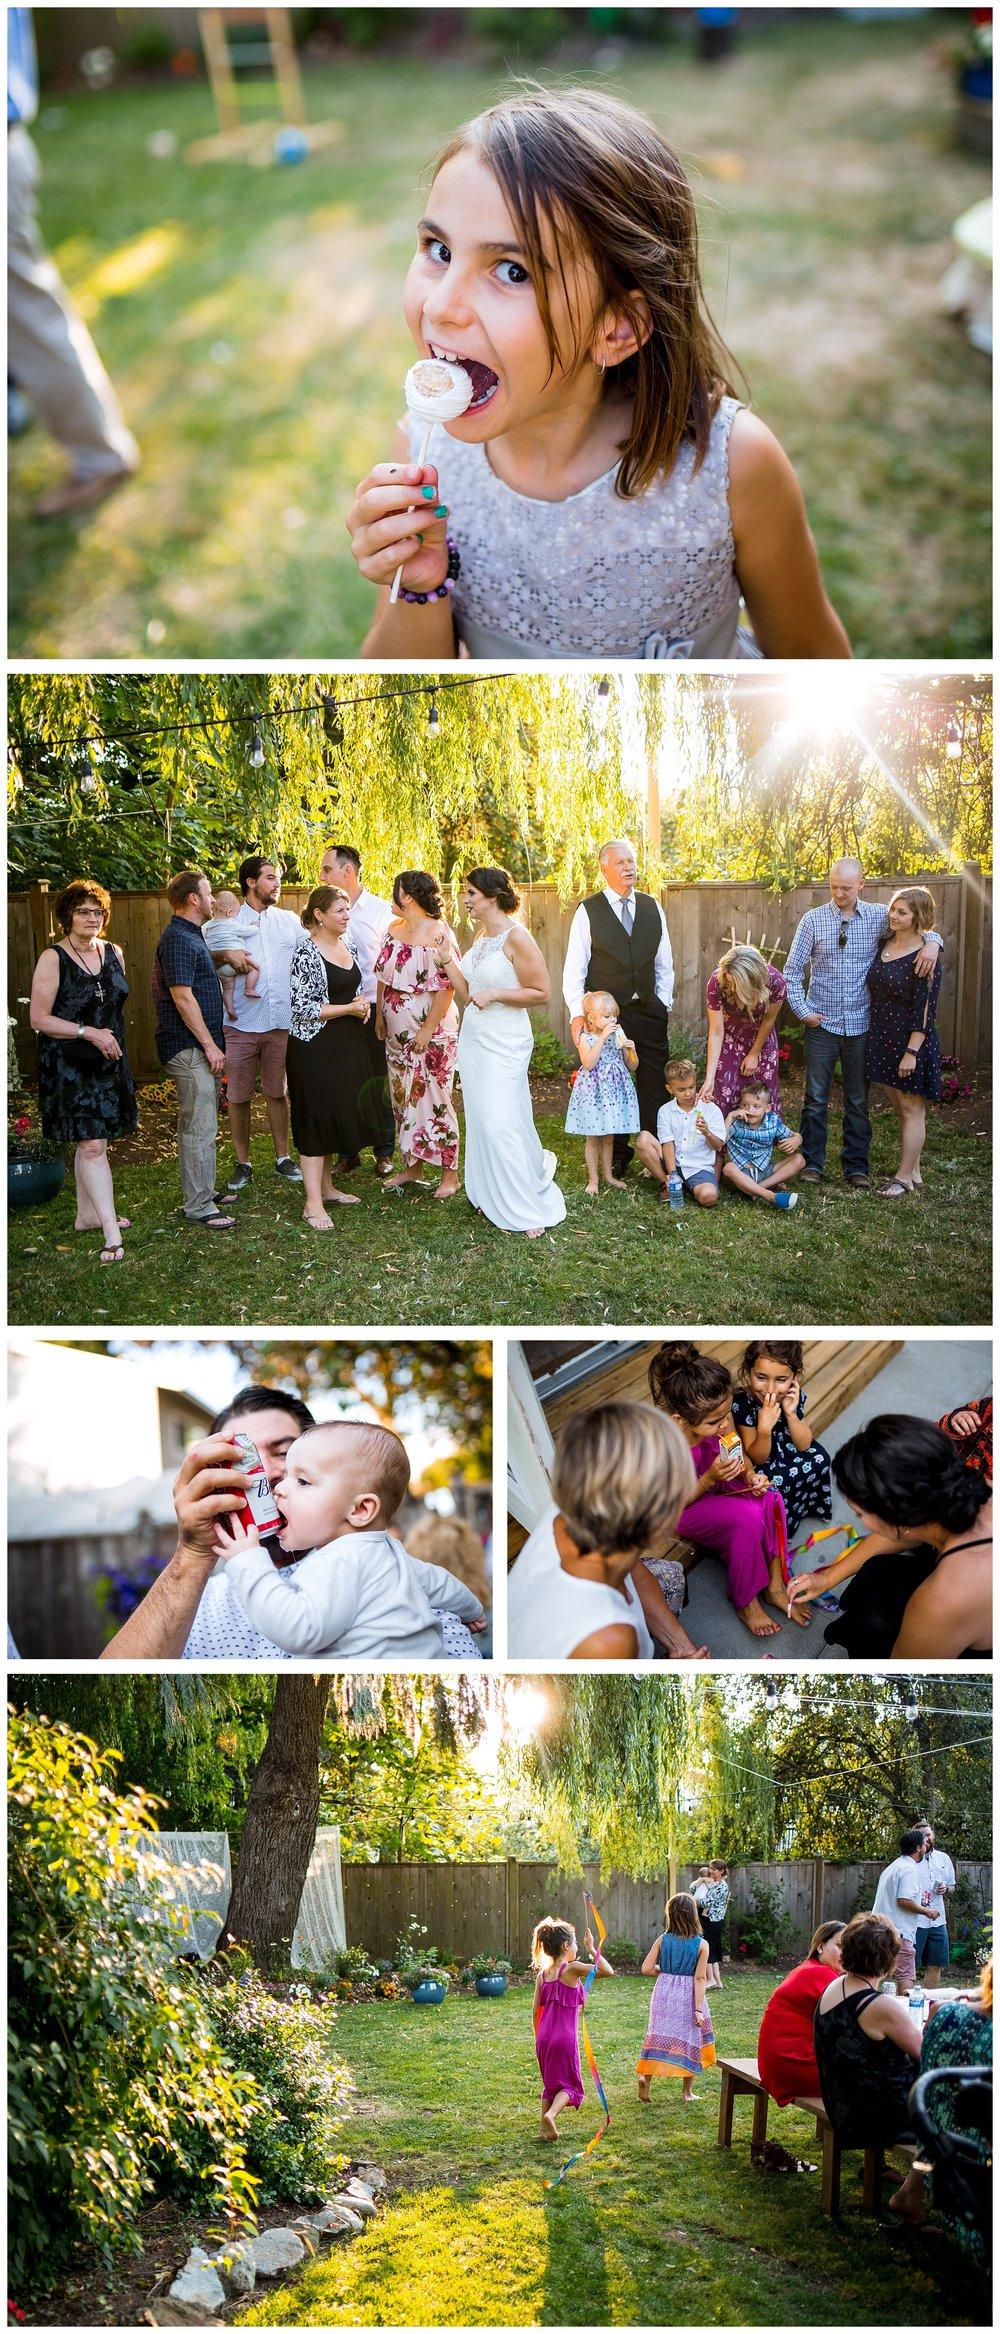 Aldergrove backyard summer wedding photographer bc canada outdoor garden inspiration family couple with kids, bride and groom_0079.jpg